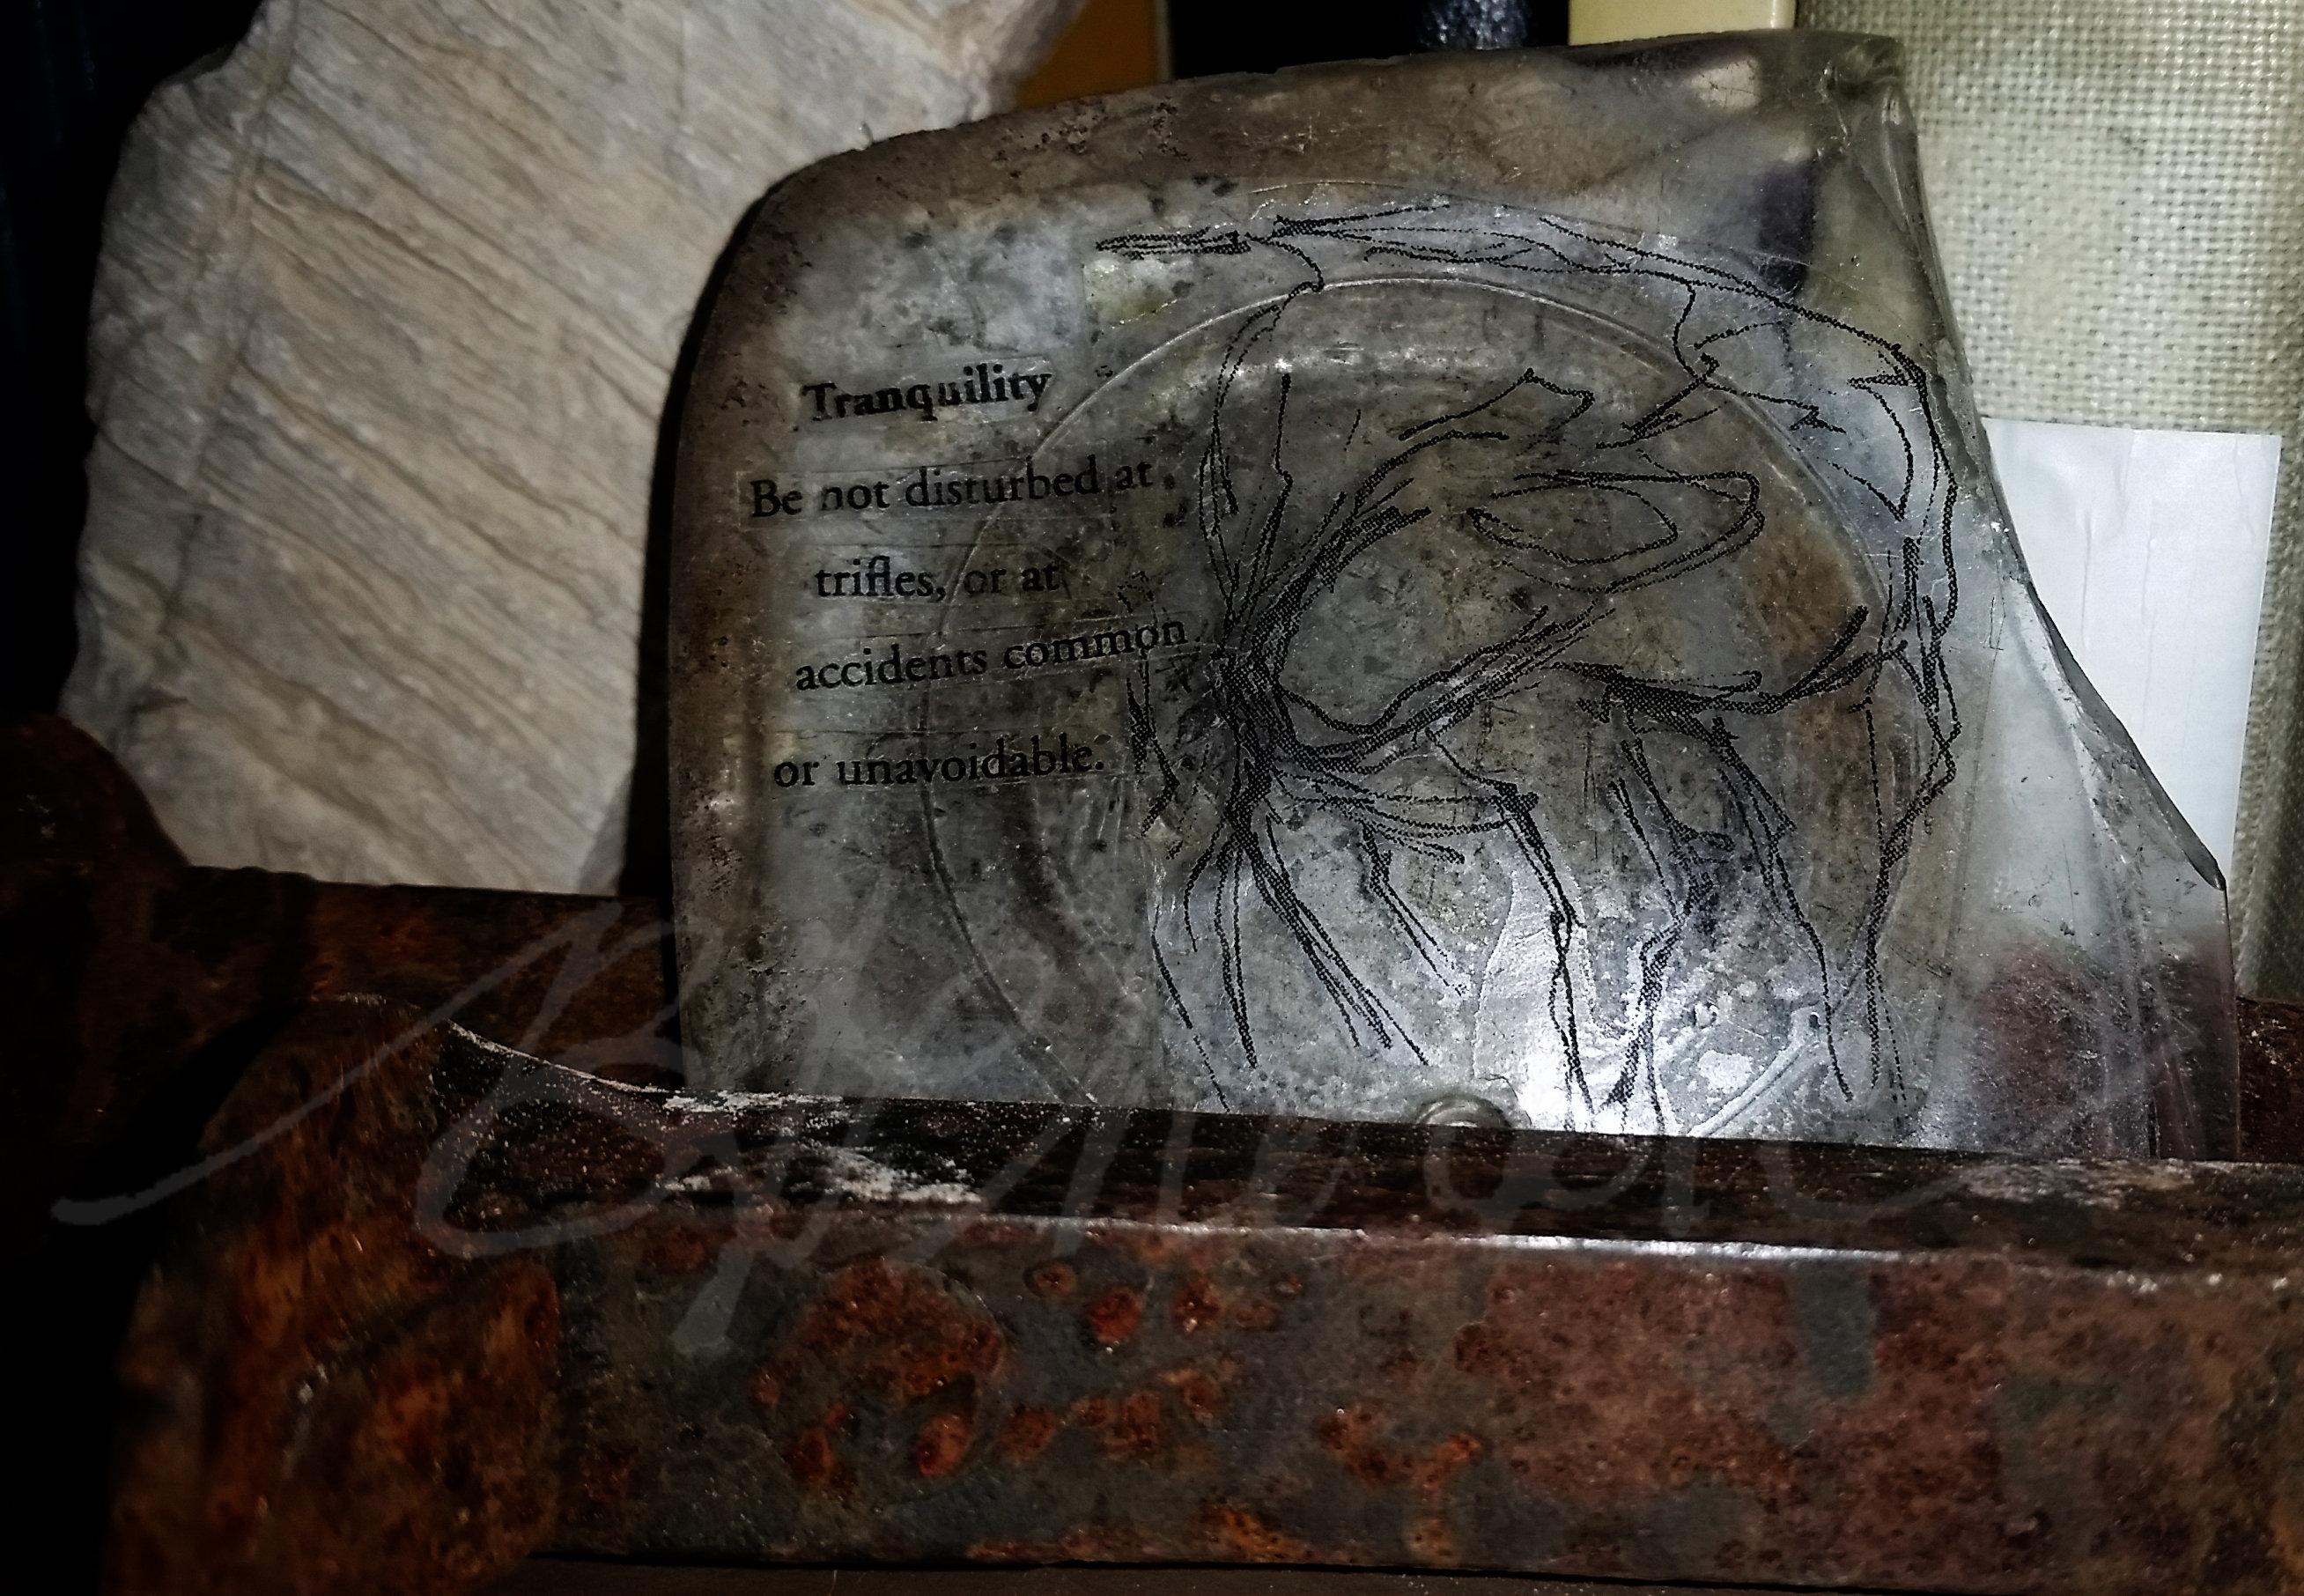 Tape-transfer sticker; sketch on glass fragment